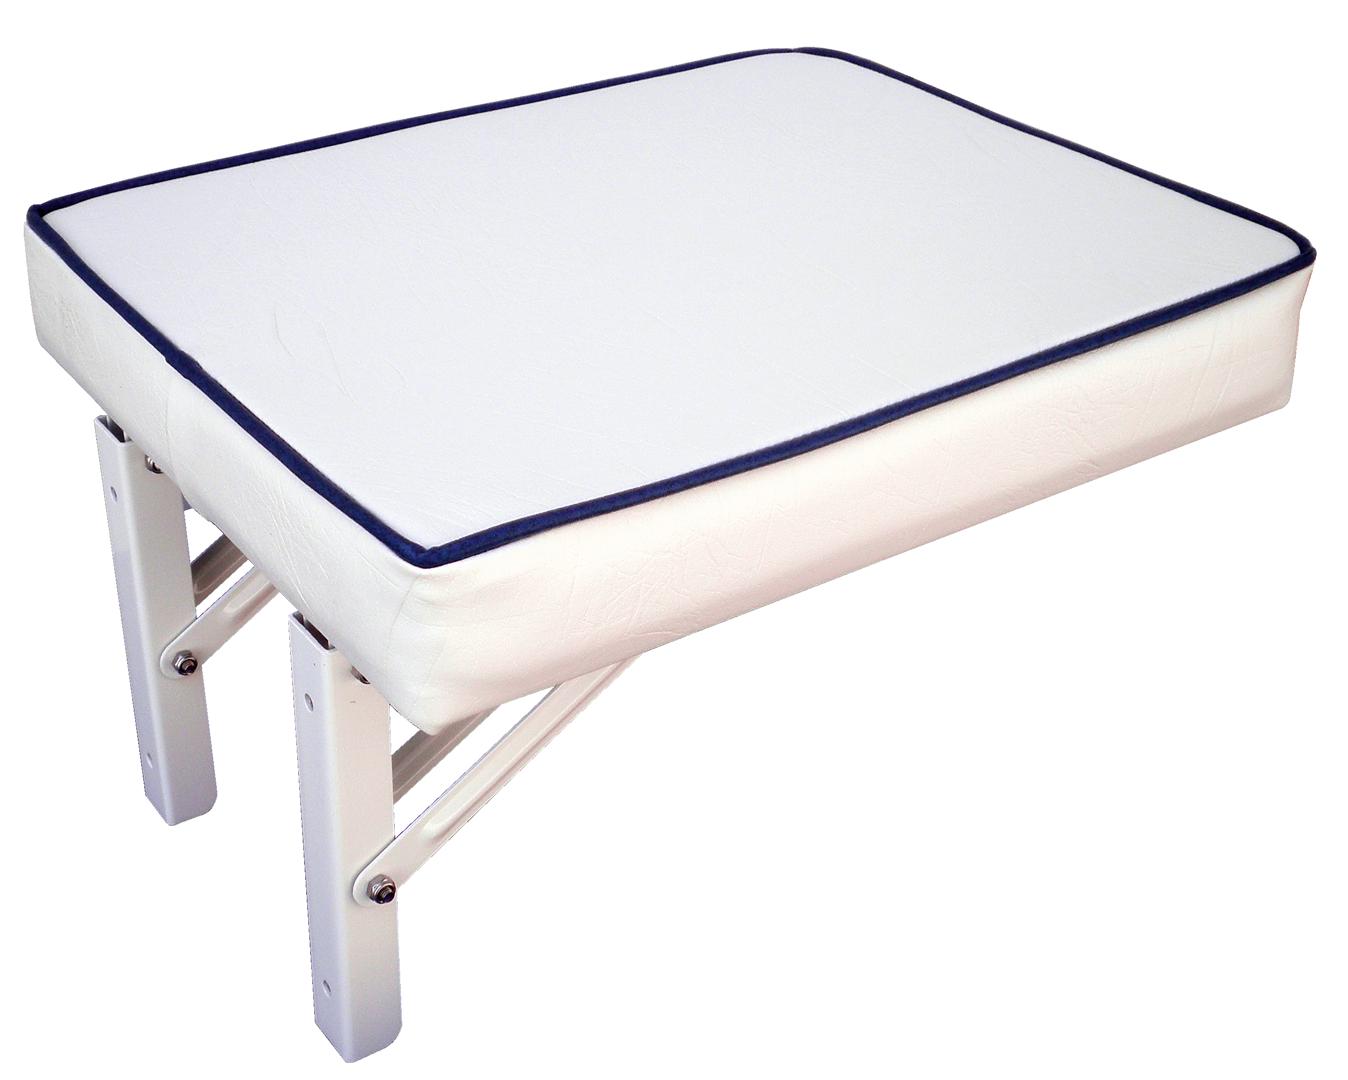 Kos Boat Seating  - Foldable